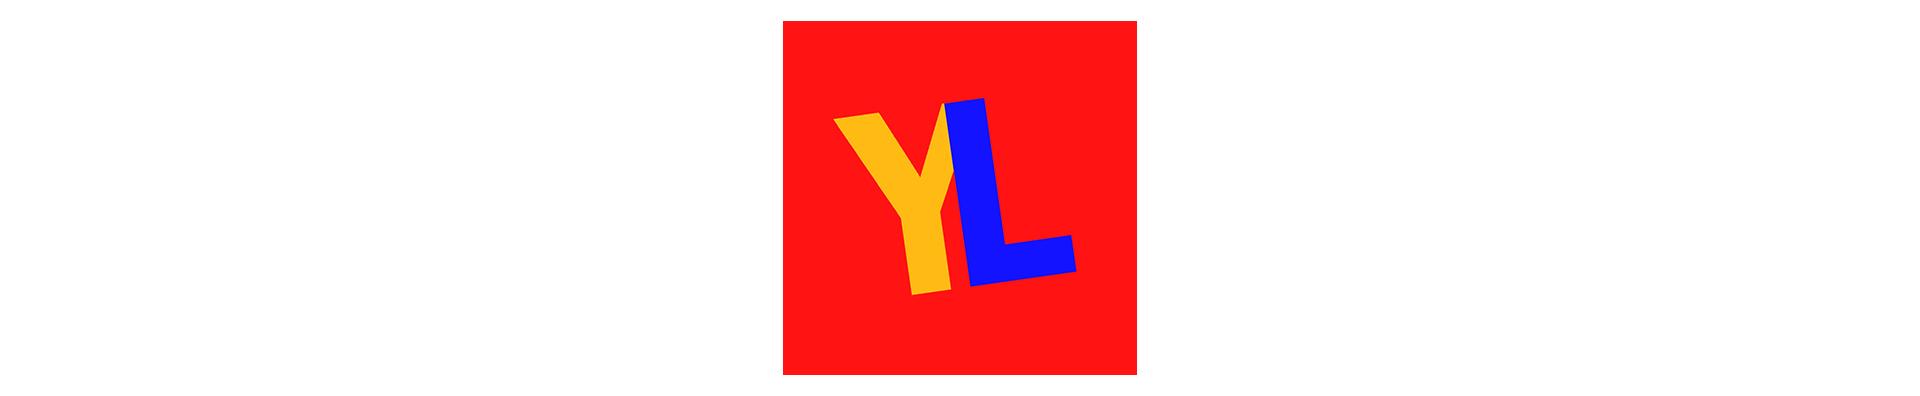 YL Logo Banner.png